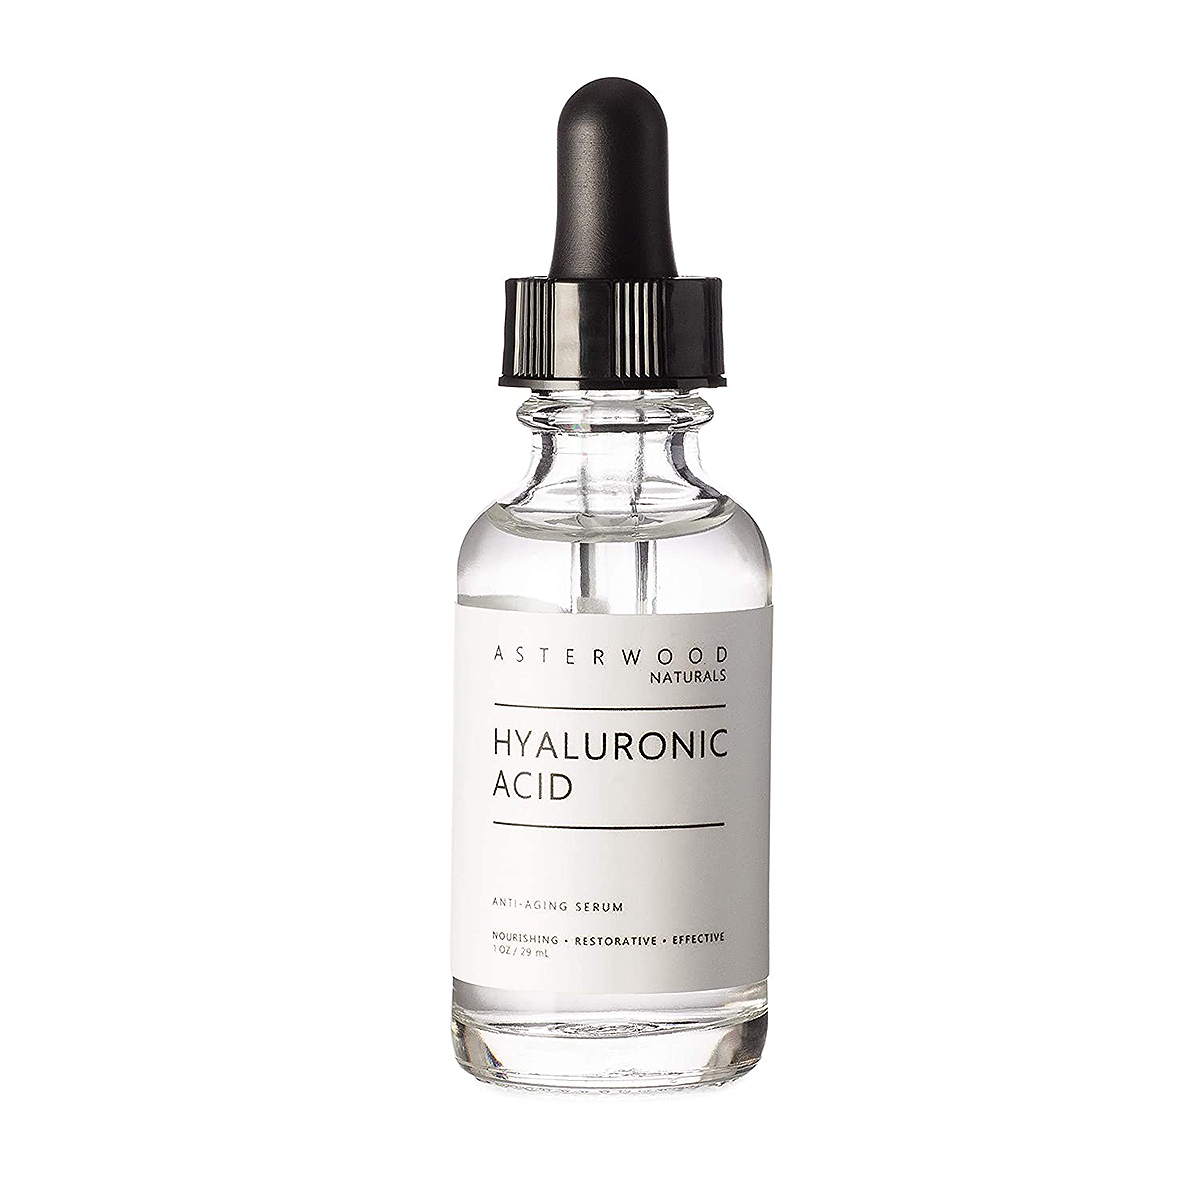 asterwood-naturals-hyaluronic-acid-serum